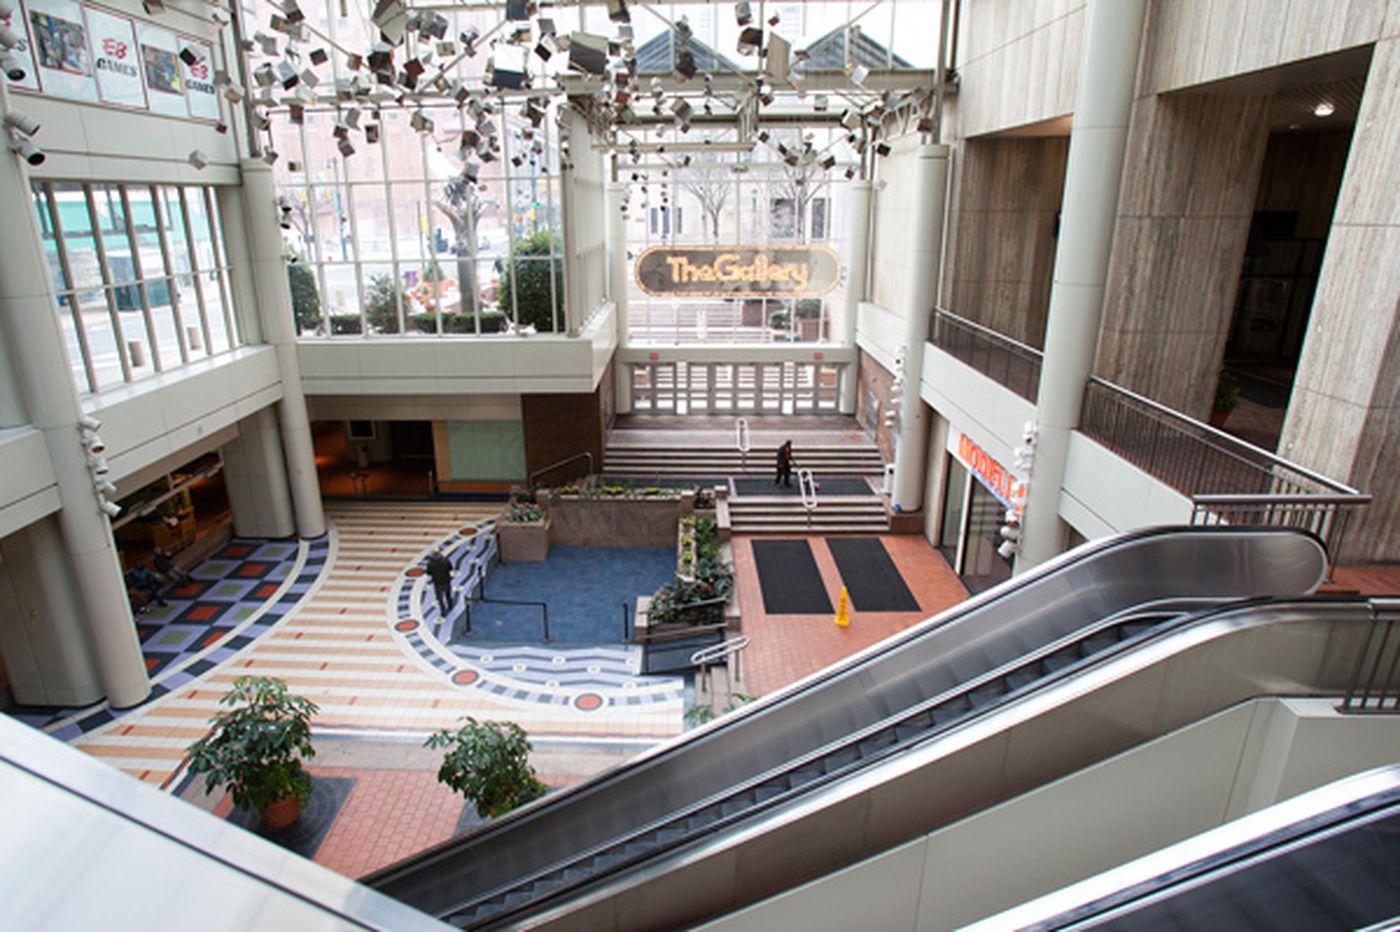 Gallery Kmart begins its long goodbye